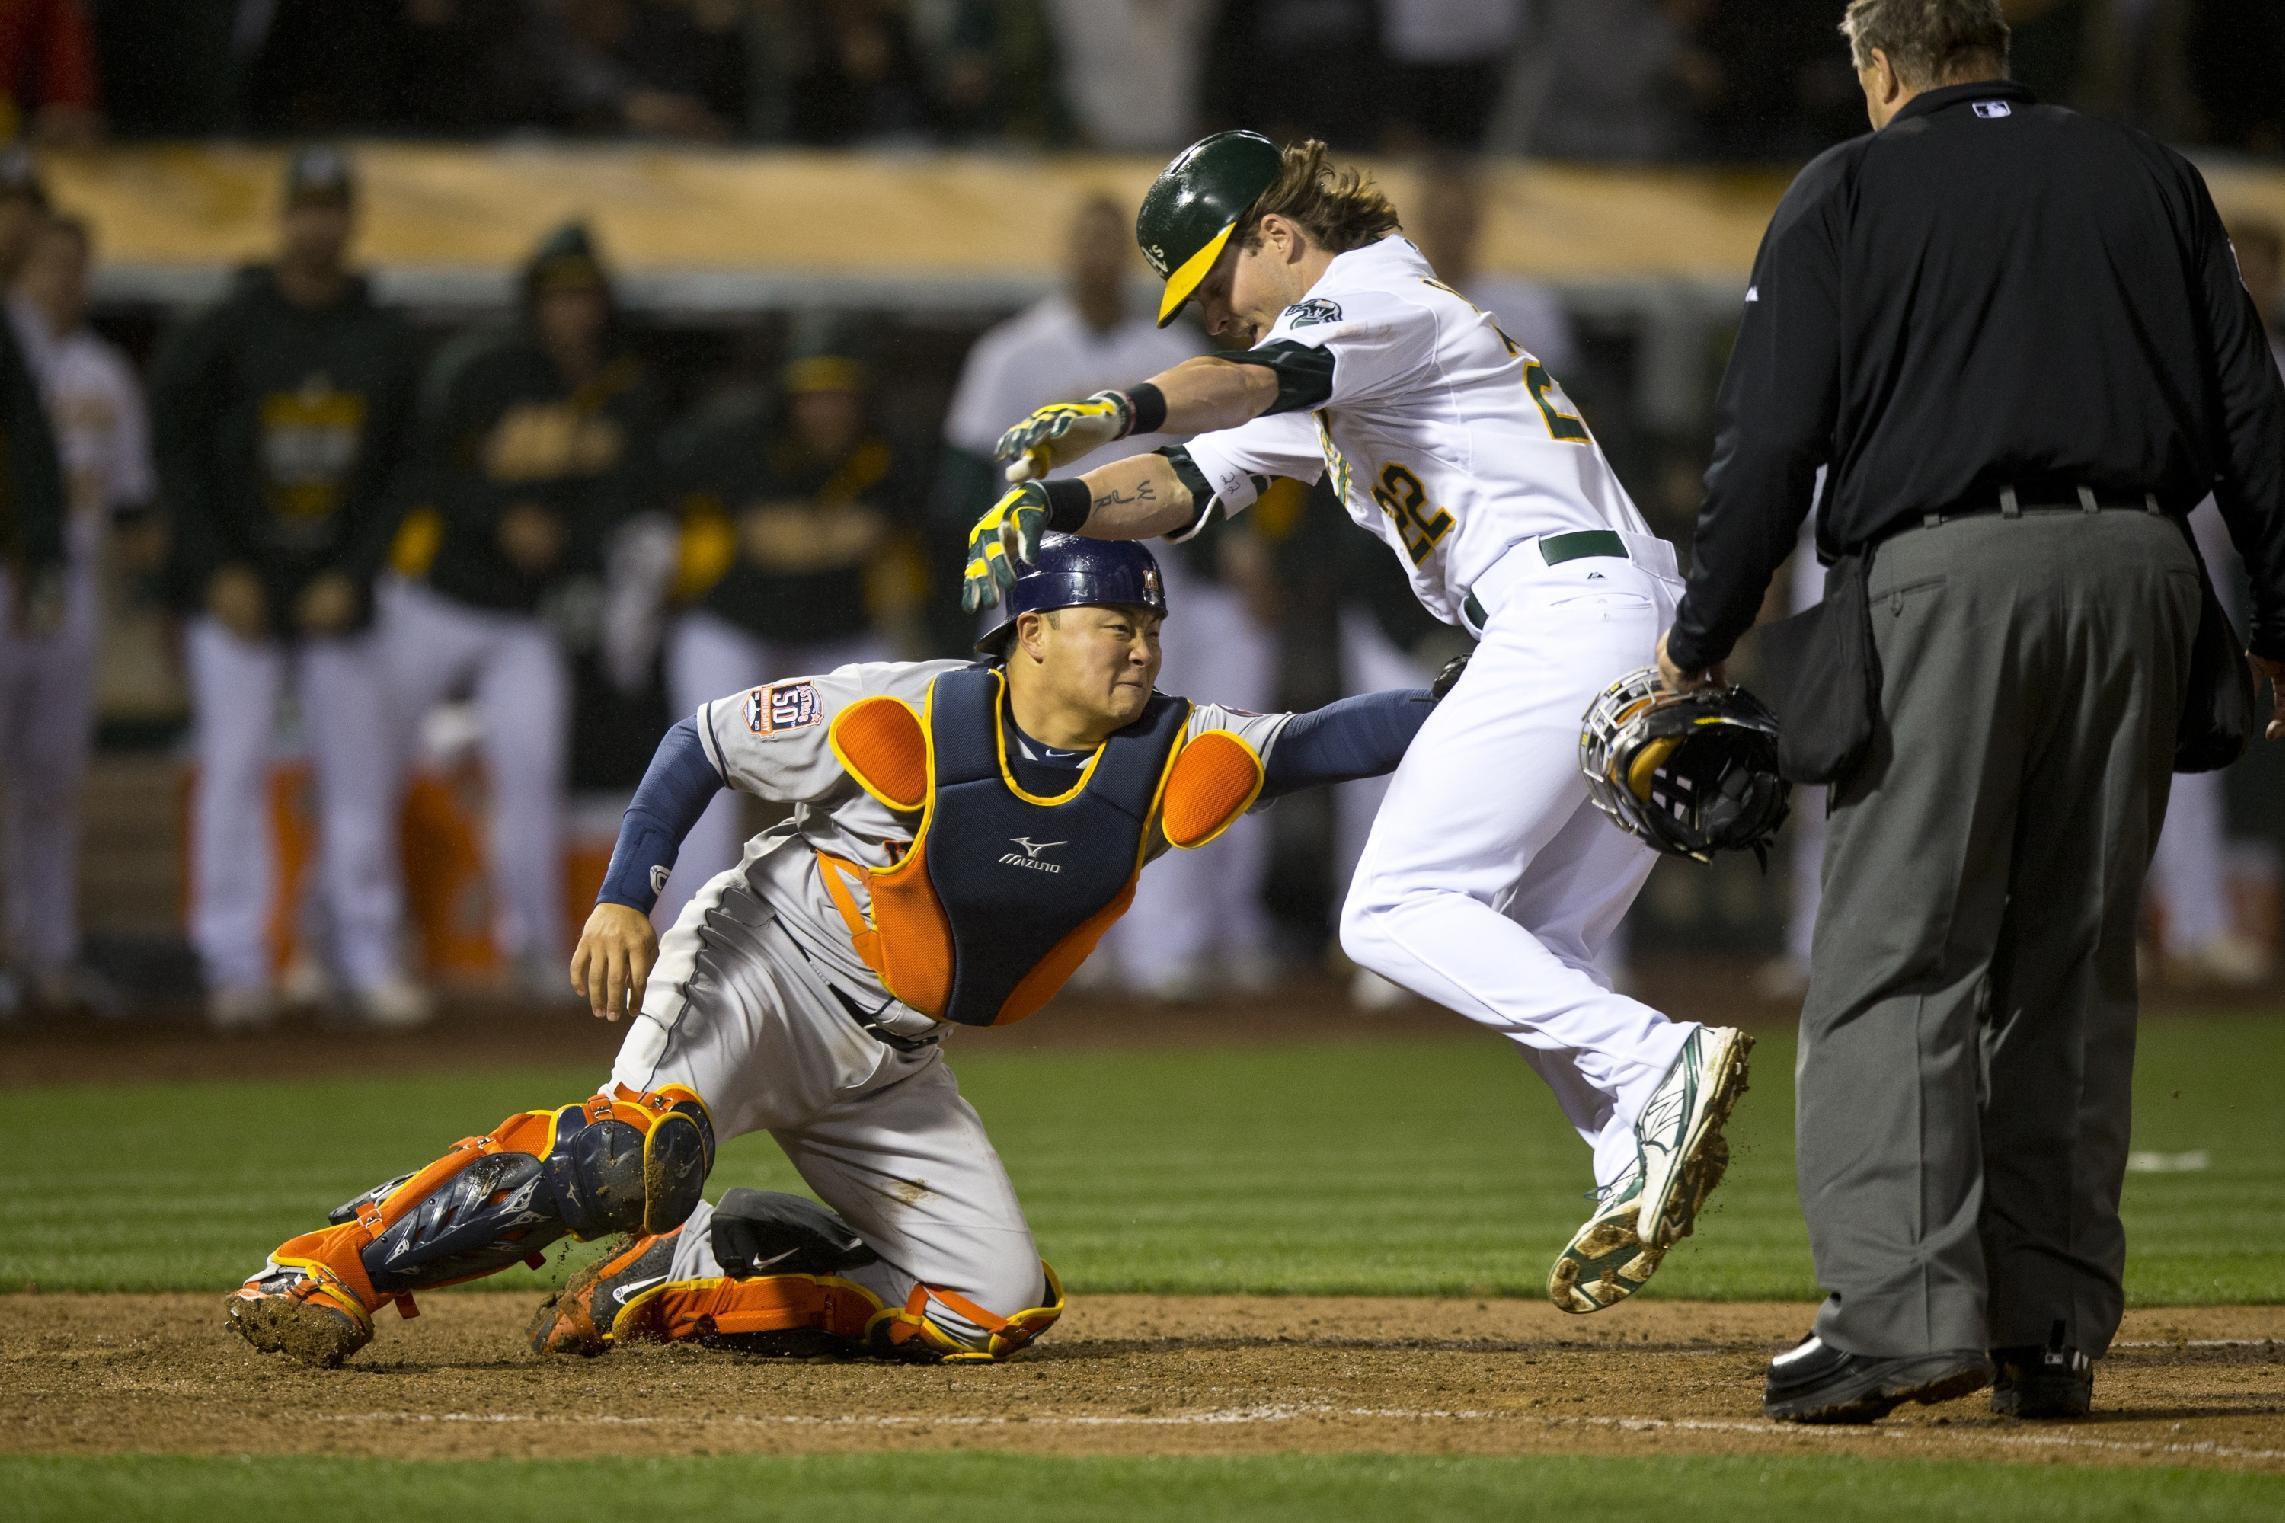 Josh Reddick nearly hit a walk-off Little League home run